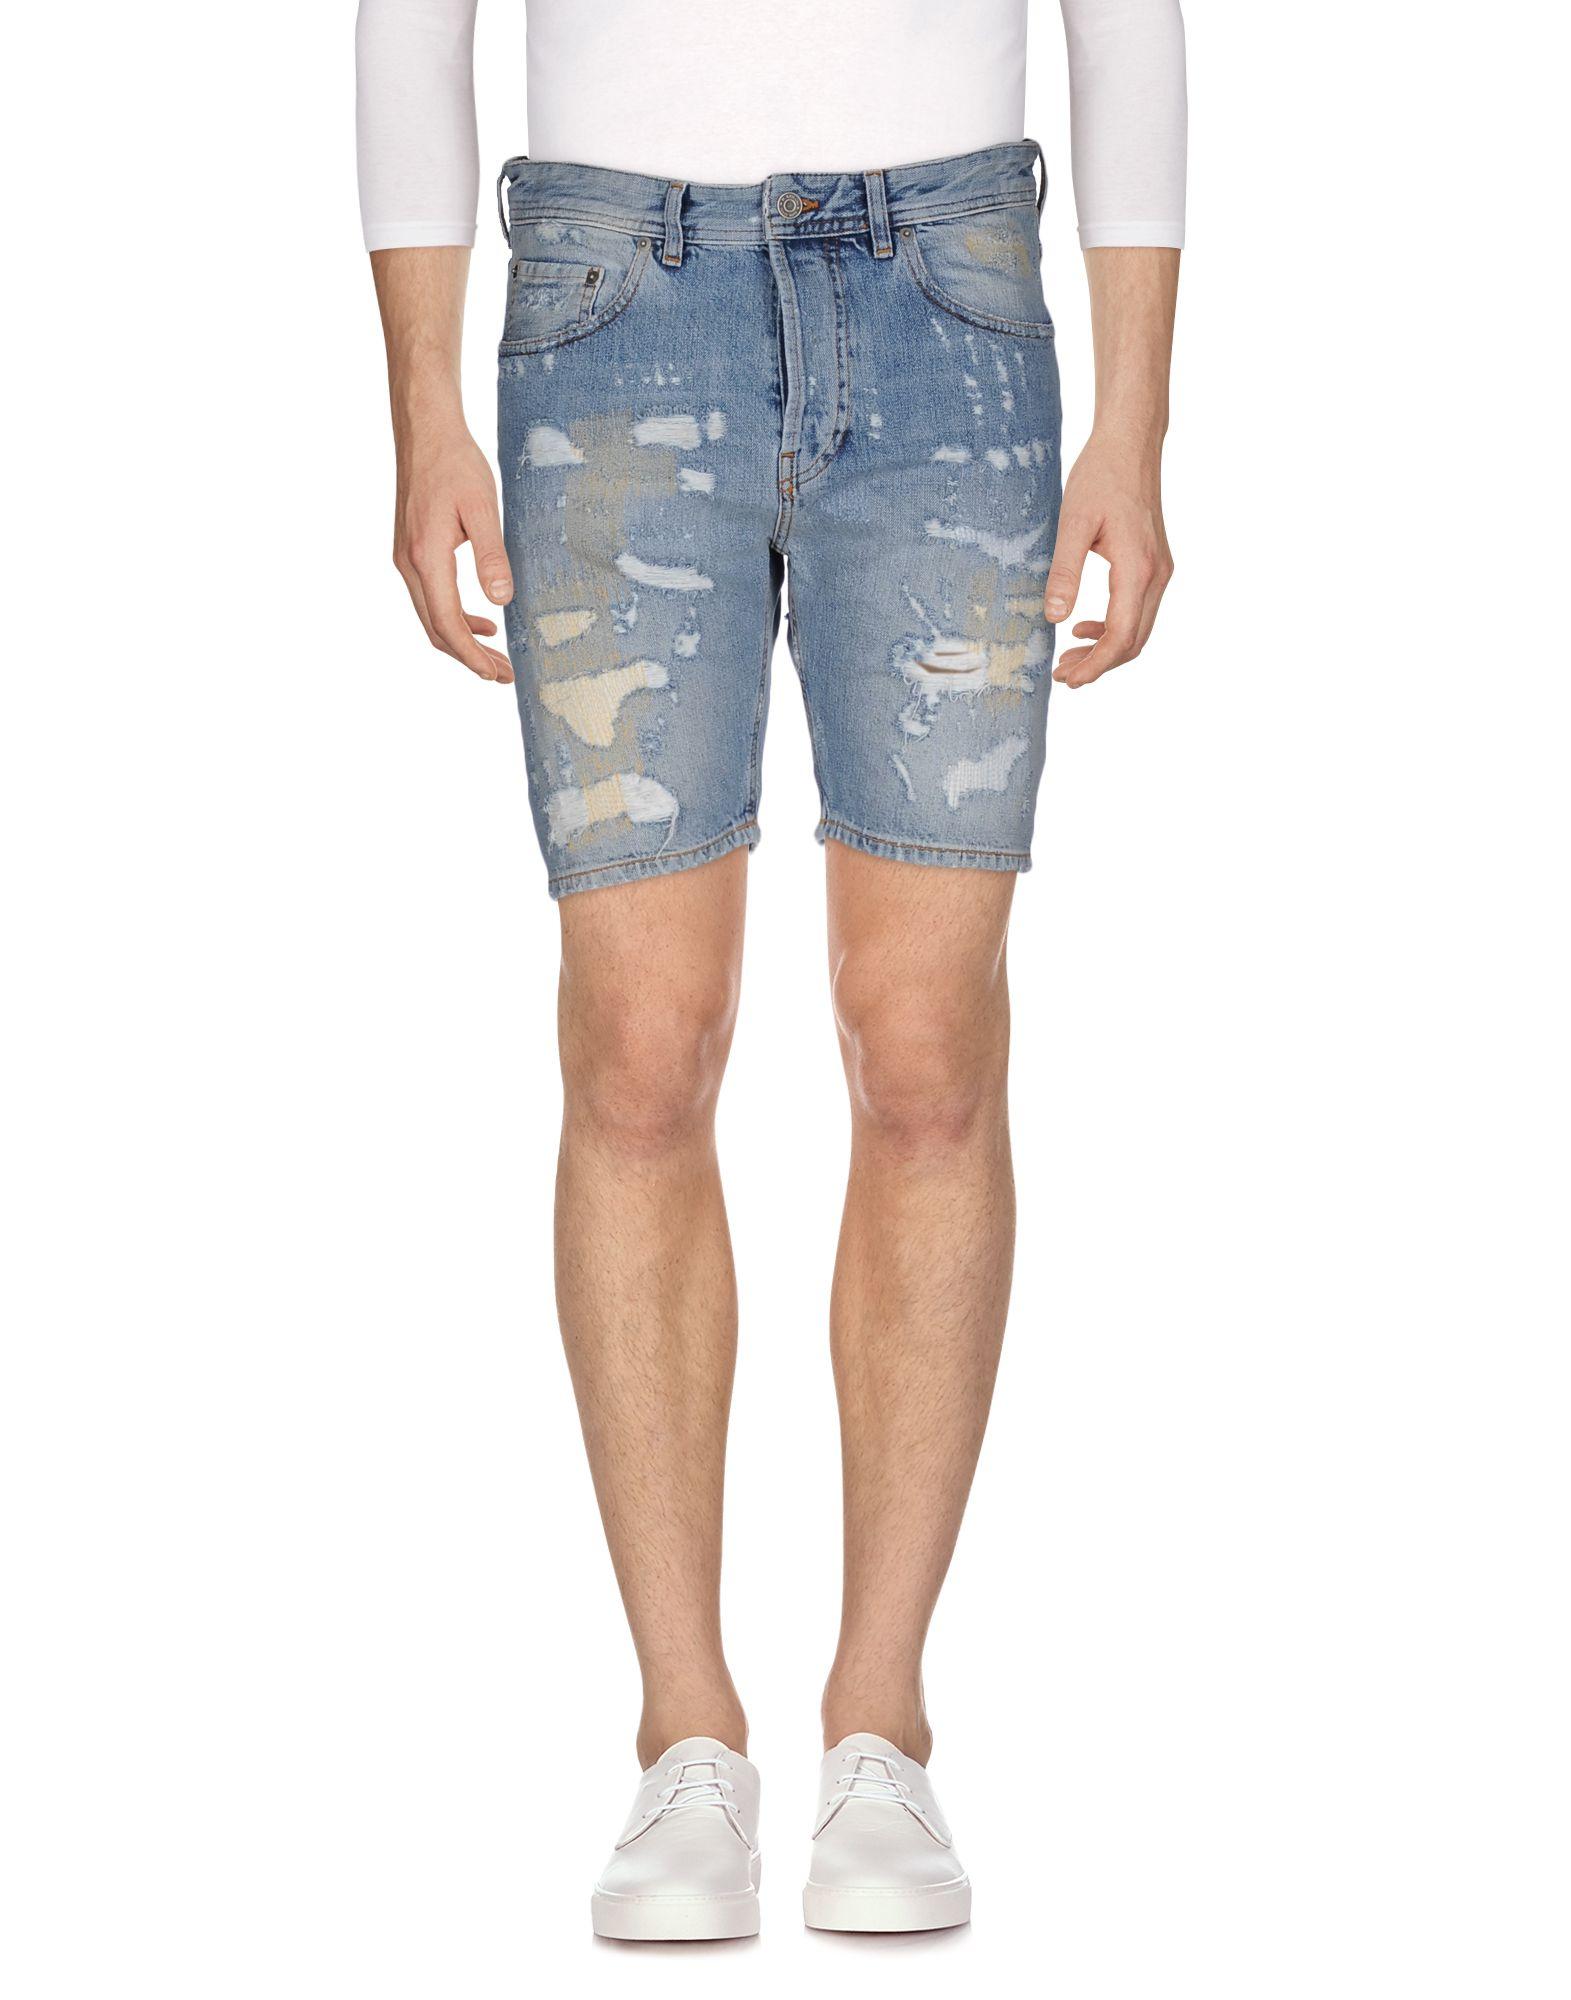 Shorts Jeans M.Grifoni Denim Uomo - Acquista online su